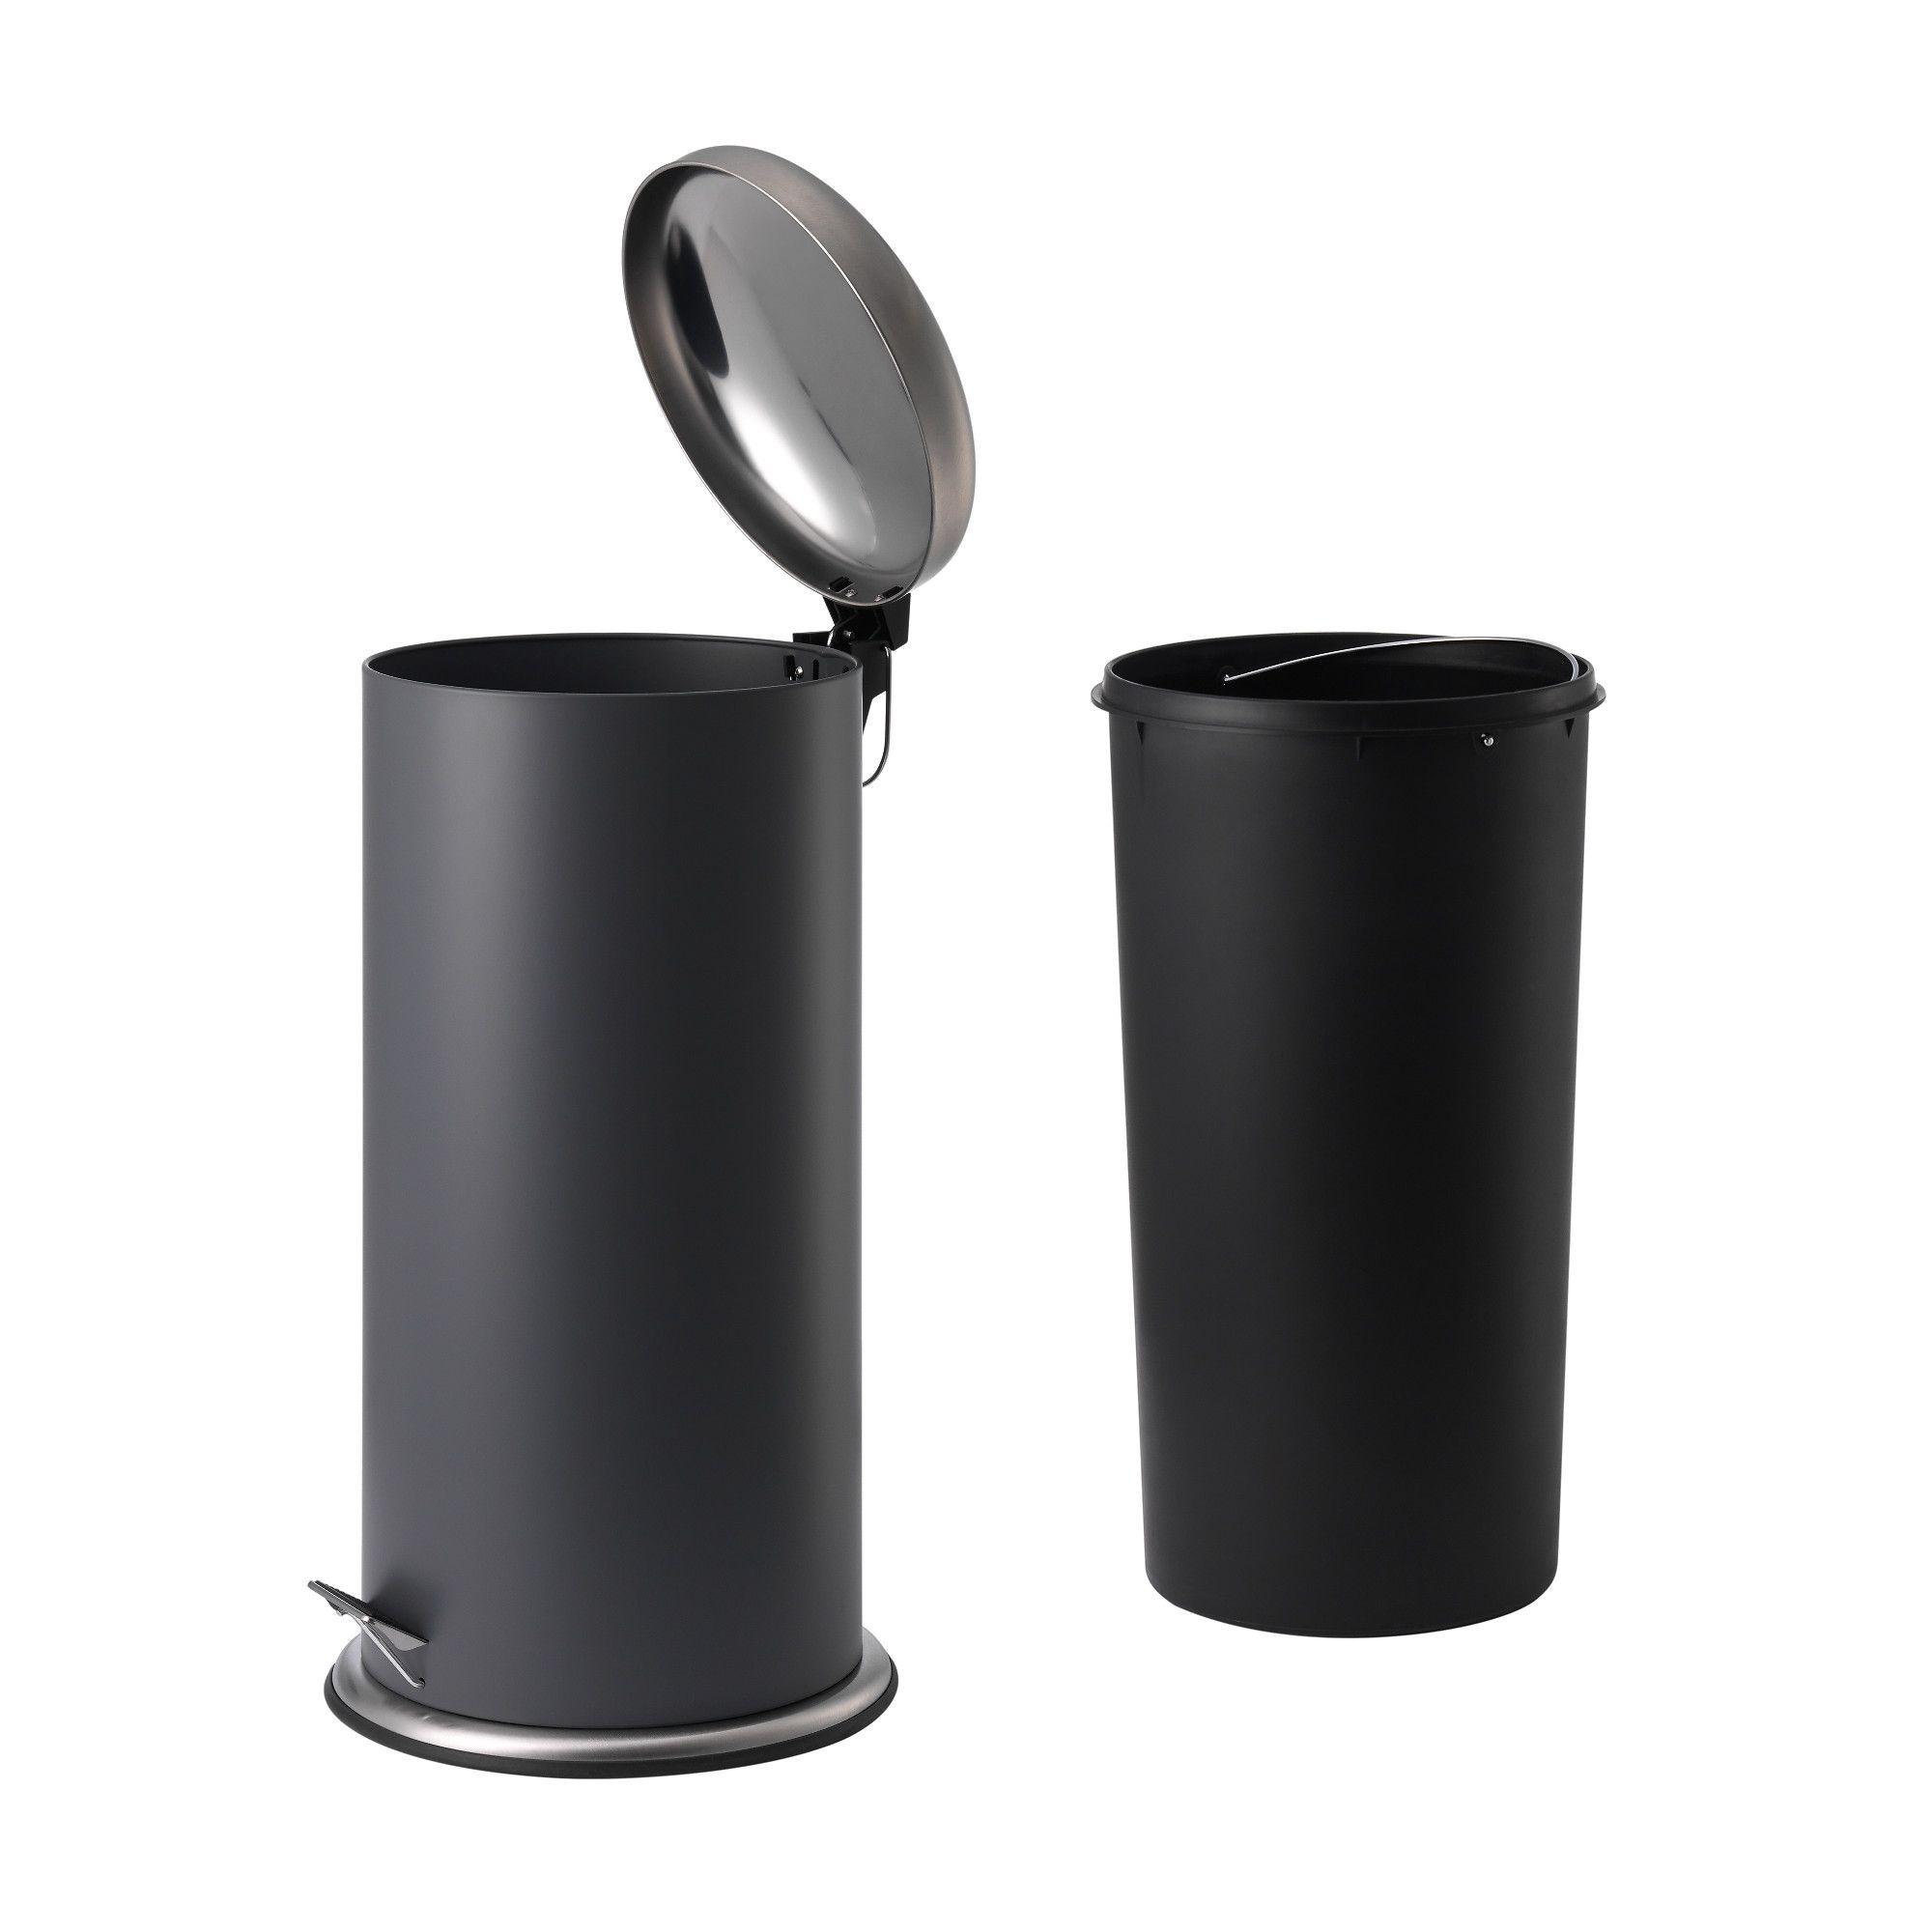 PVC COATED 3 Litre PEDEL BIN &TOILET BRUSH HOLDER BLACK BATHROOM WASTE STAIN Waste Bins & Dustbins